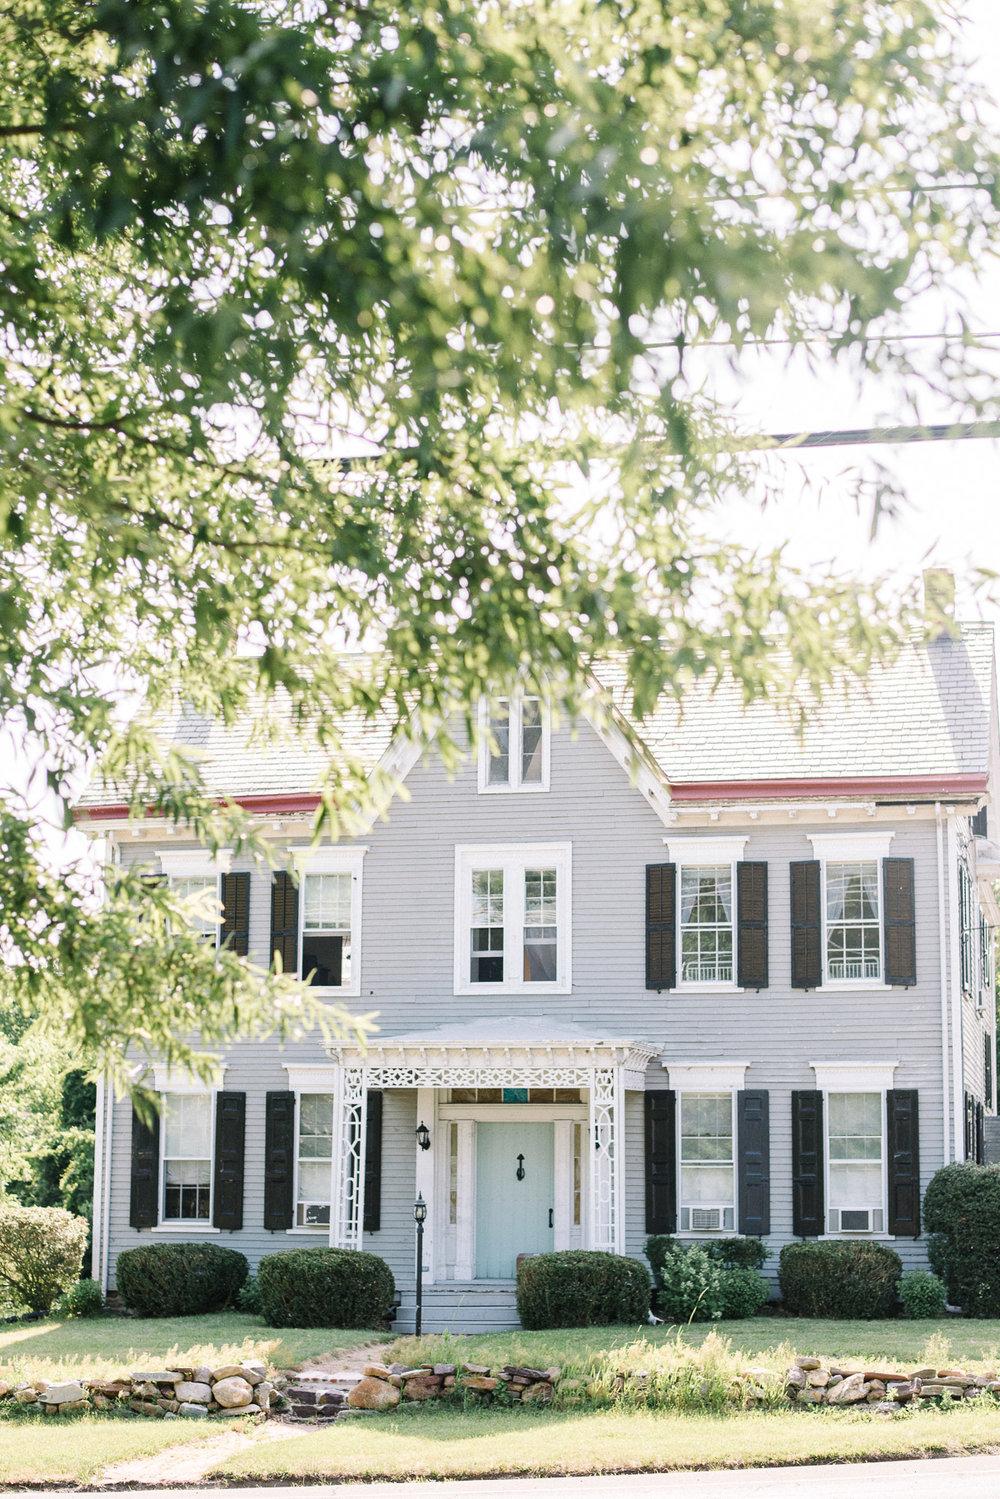 Victorian Home in Hamilton New Jersey